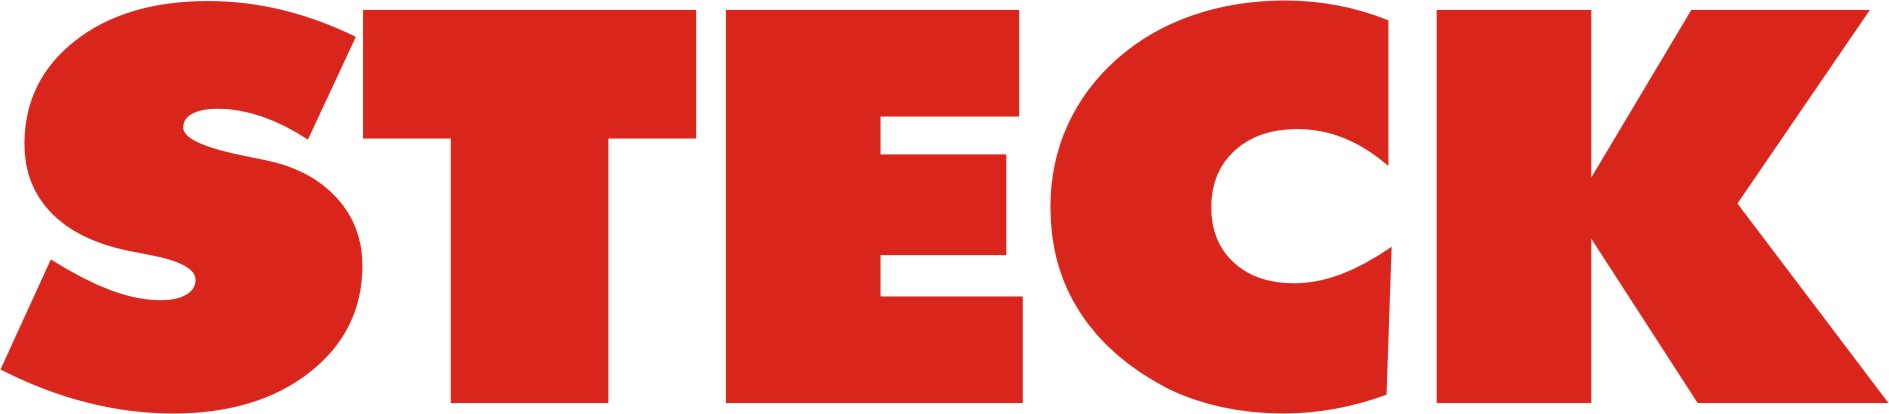 logo_steck.jpg